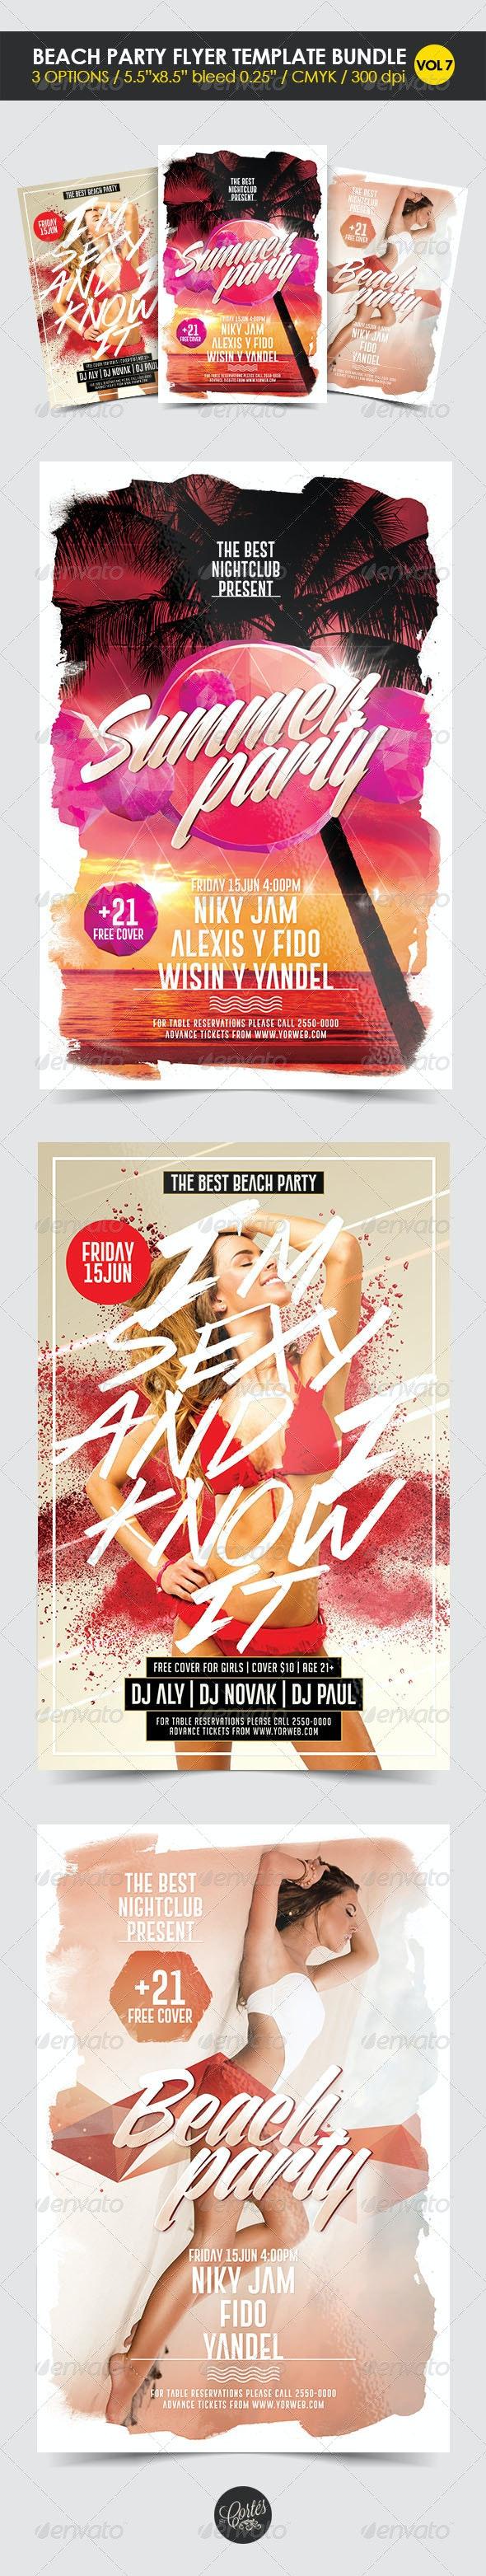 Beach Party Flyer Template Bundle Vol. 7 - Clubs & Parties Events